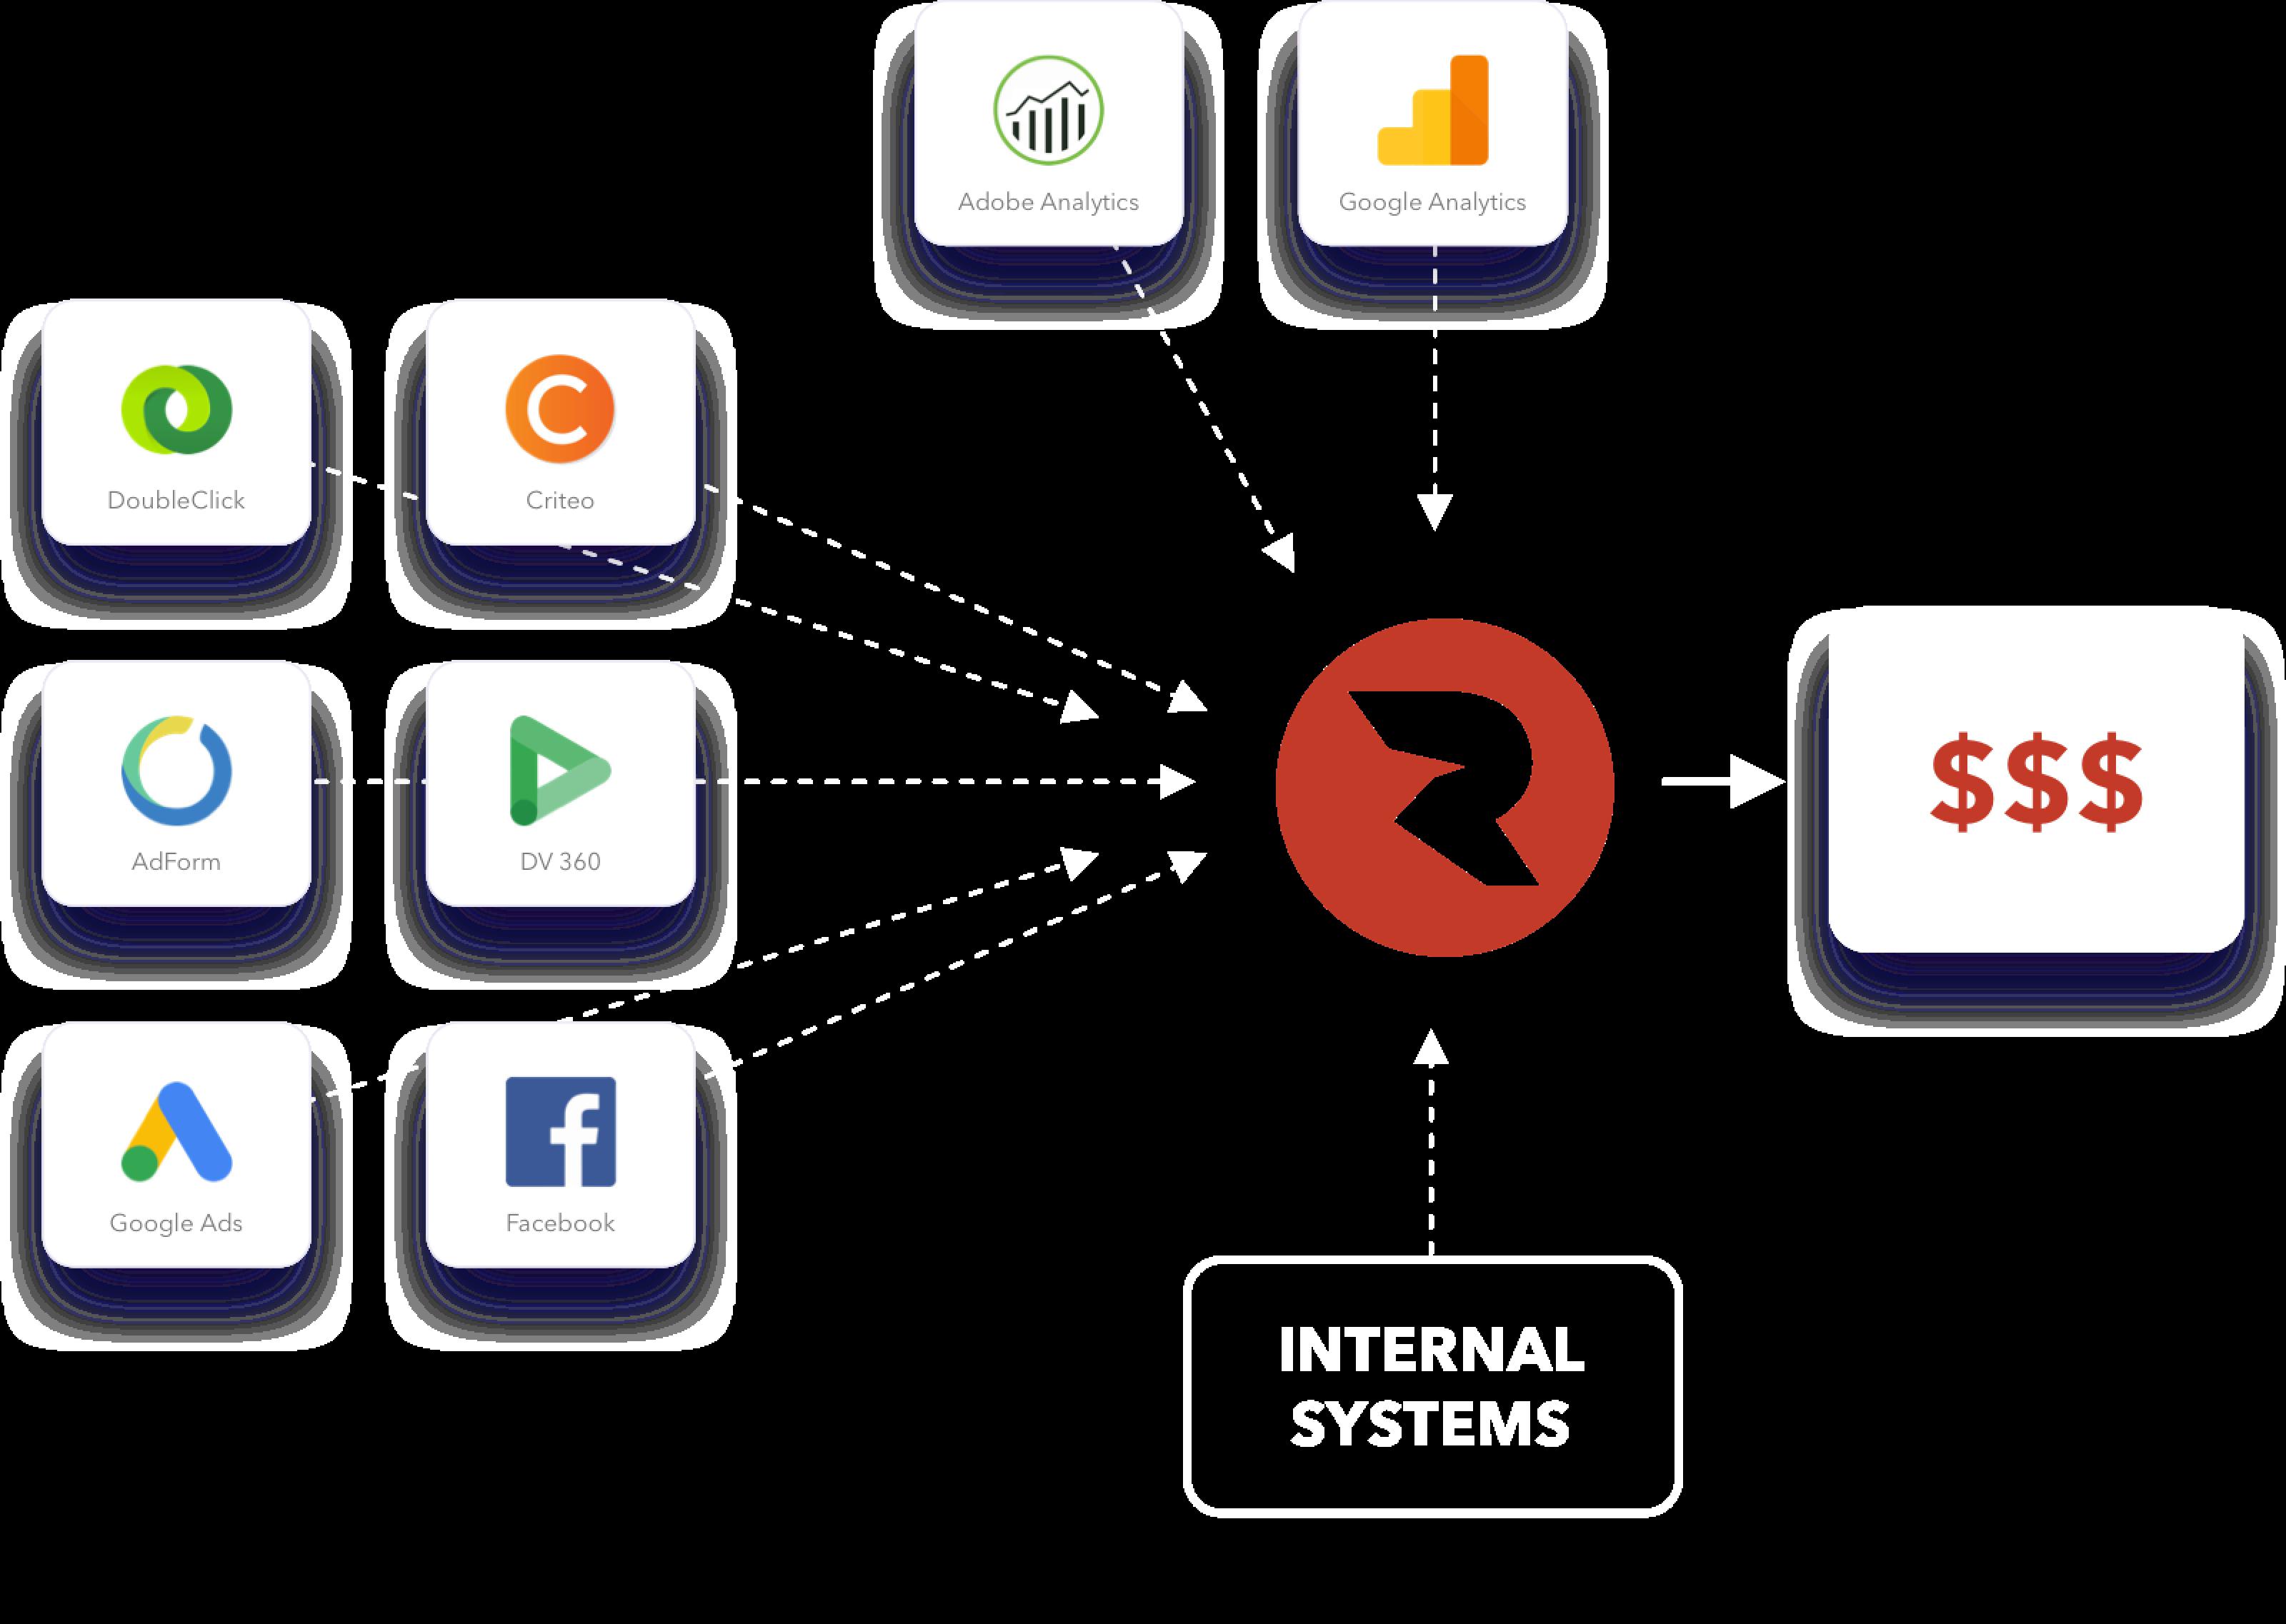 marketing analytics, attribution and optimization